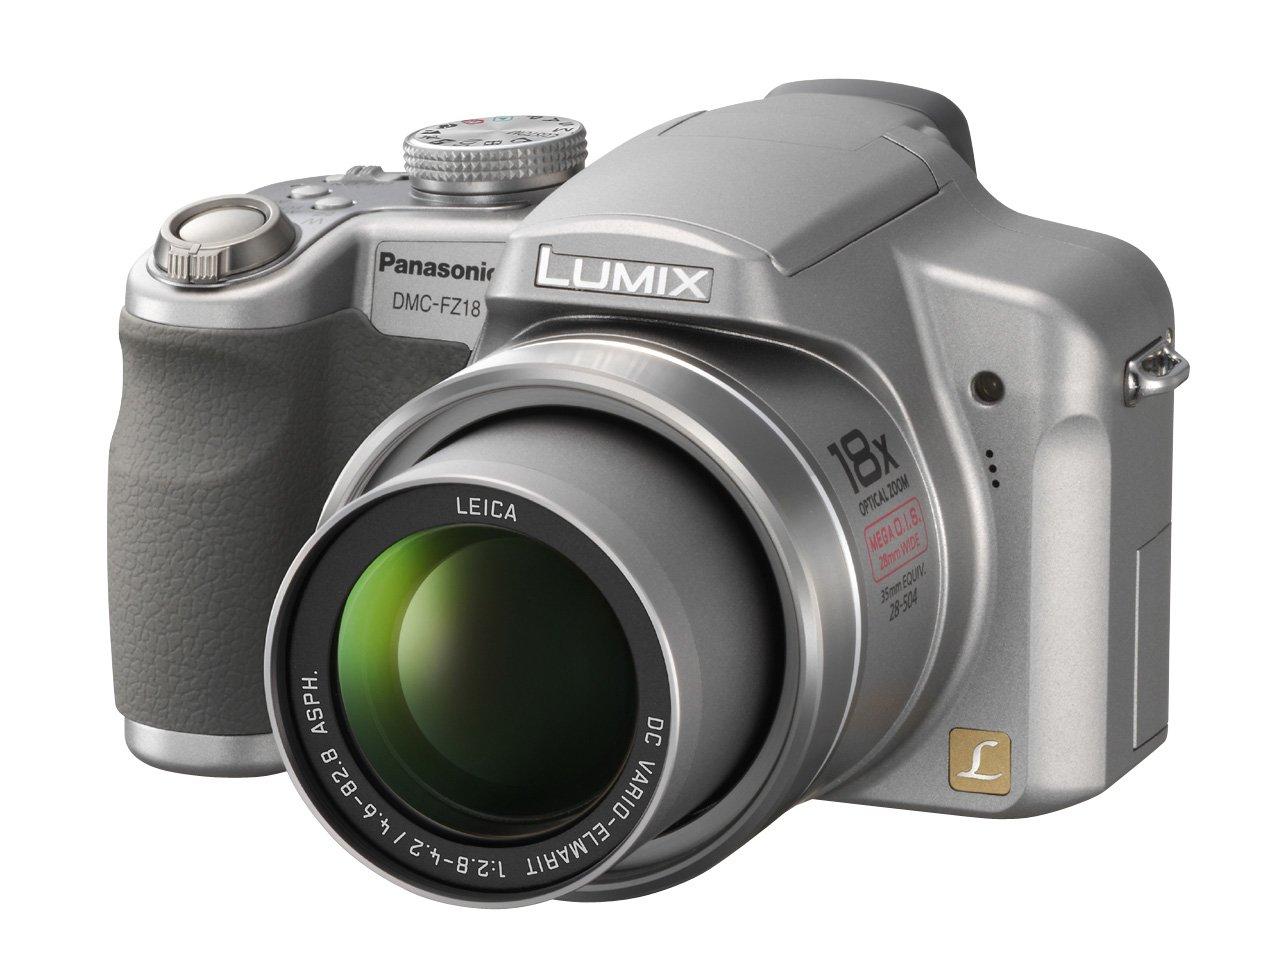 amazon com panasonic lumix dmc fz18s 8 1mp digital camera with 18x rh amazon com Panasonic Lumix DMC FZ18 Software Panasonic DMC FZ18 Battery Charger